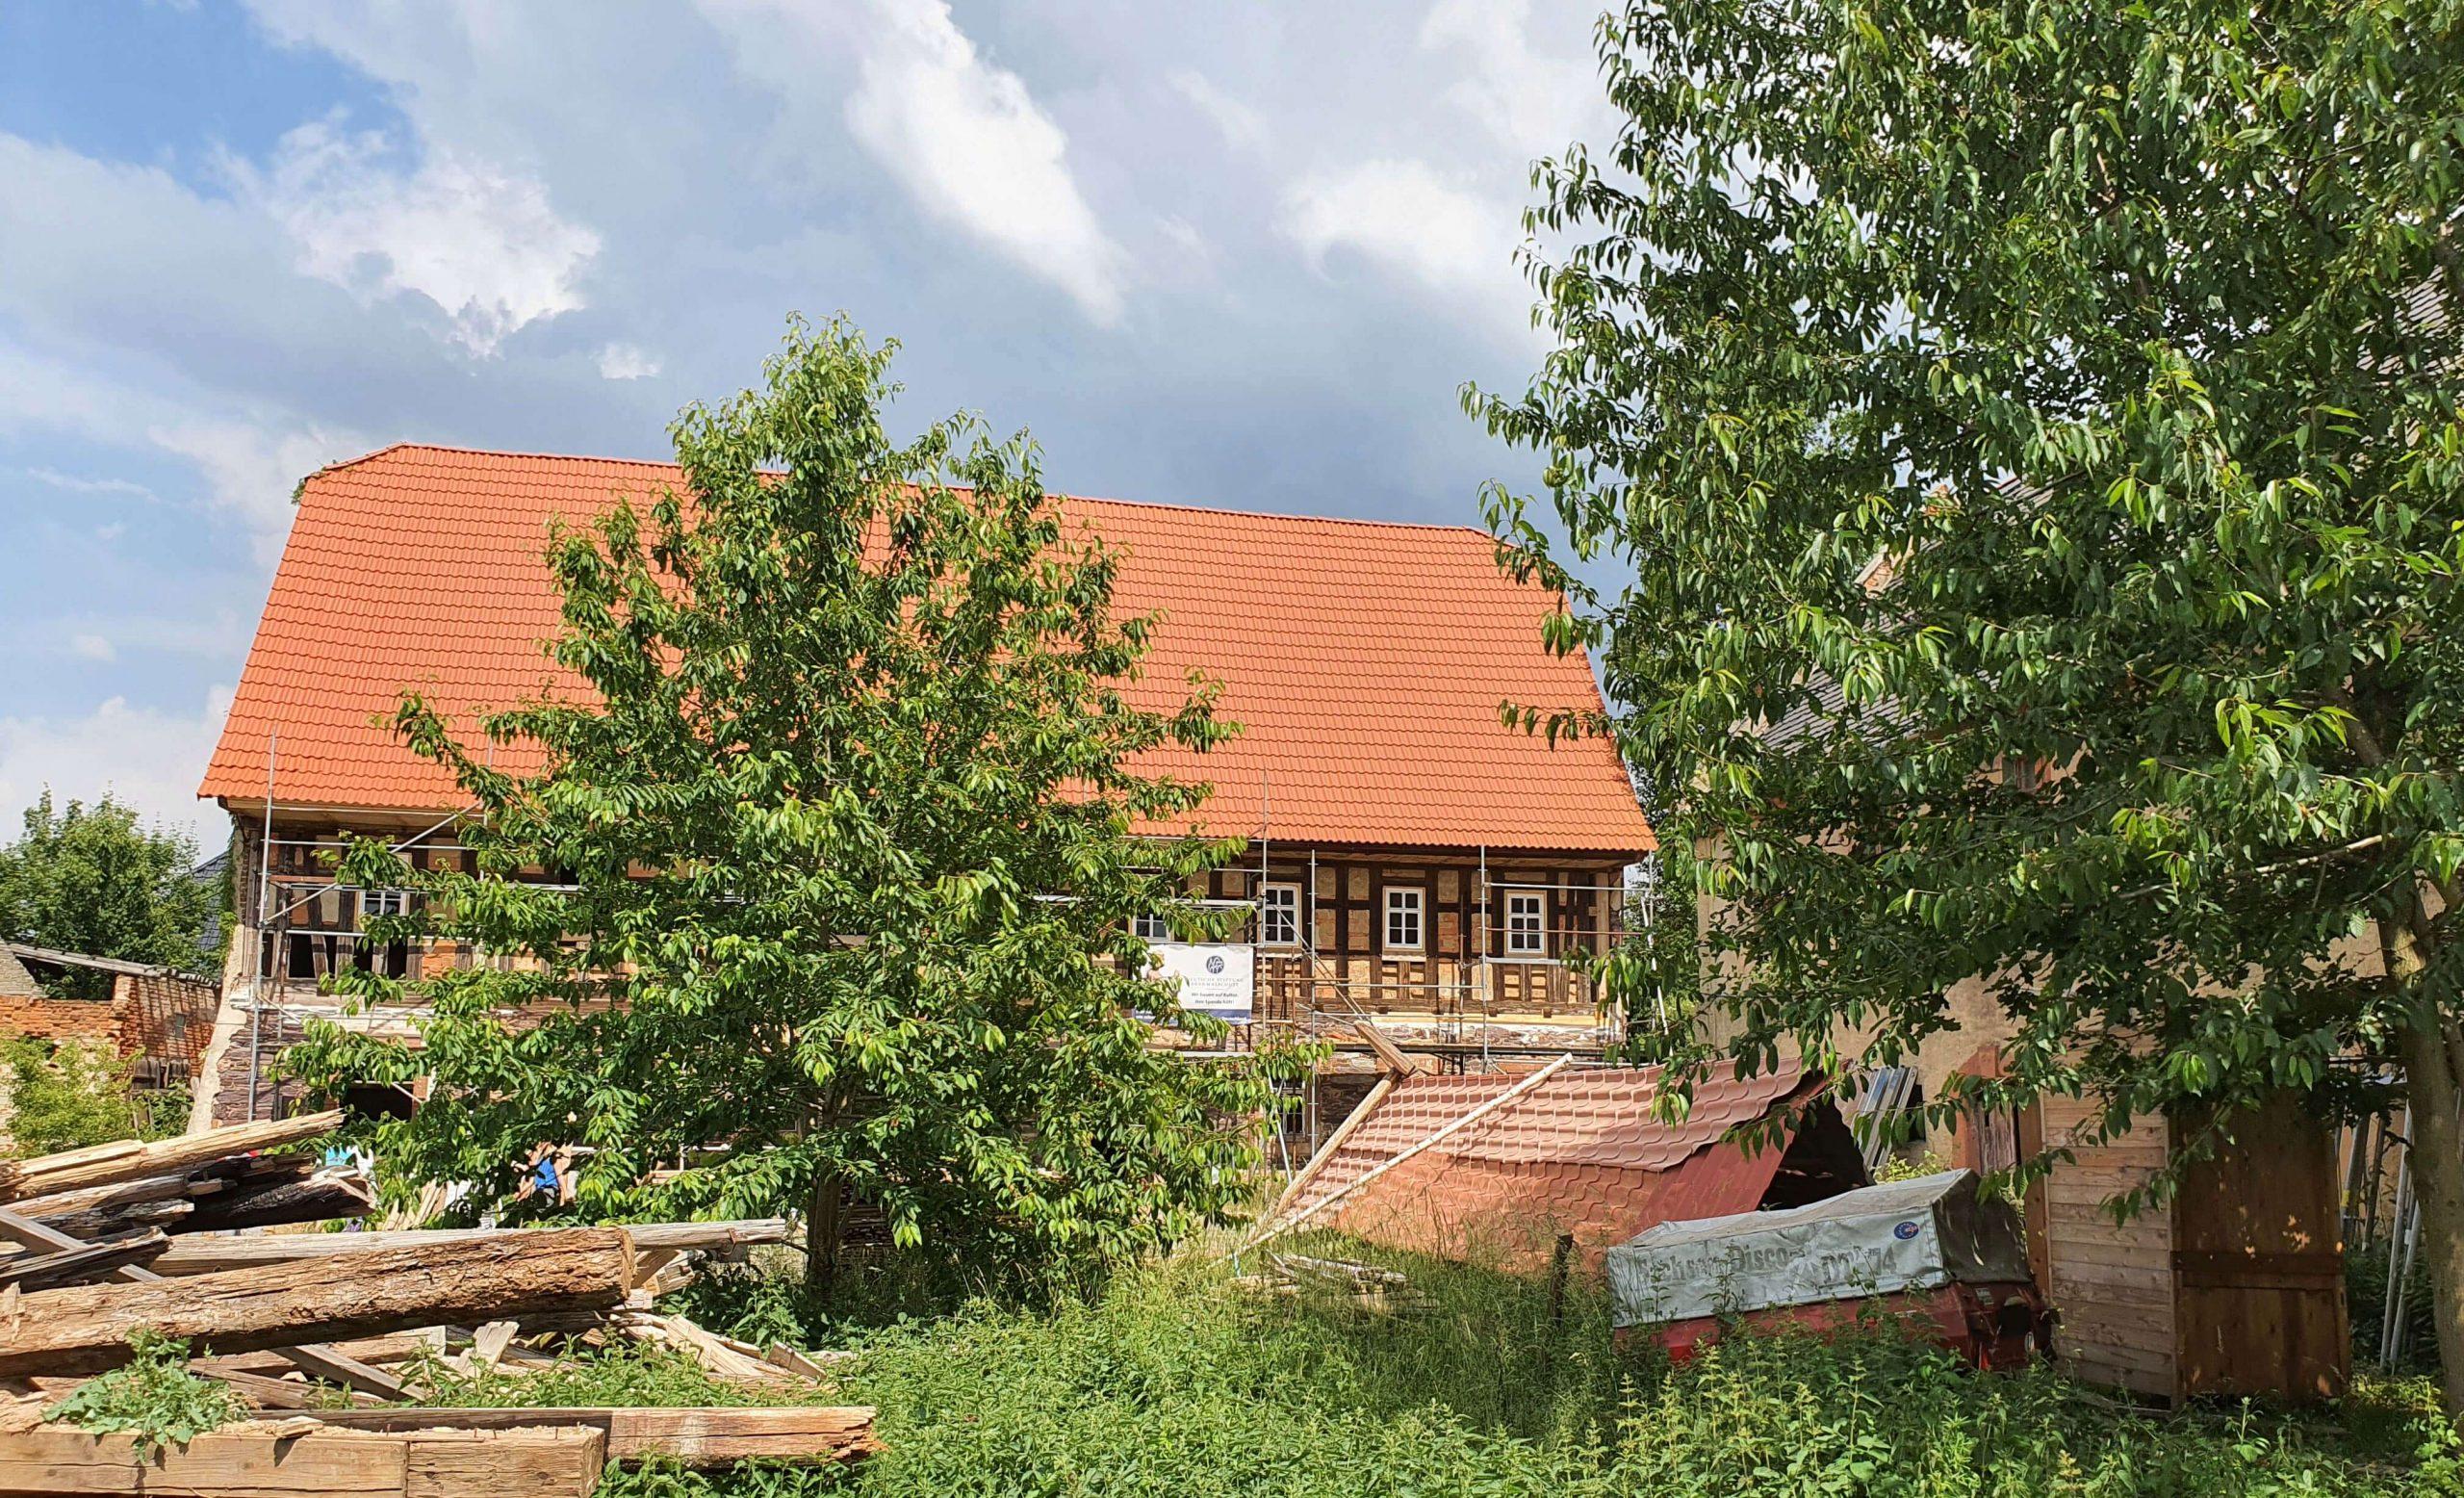 Innenhof des Kulturhofs, Foto: Maike Steuer